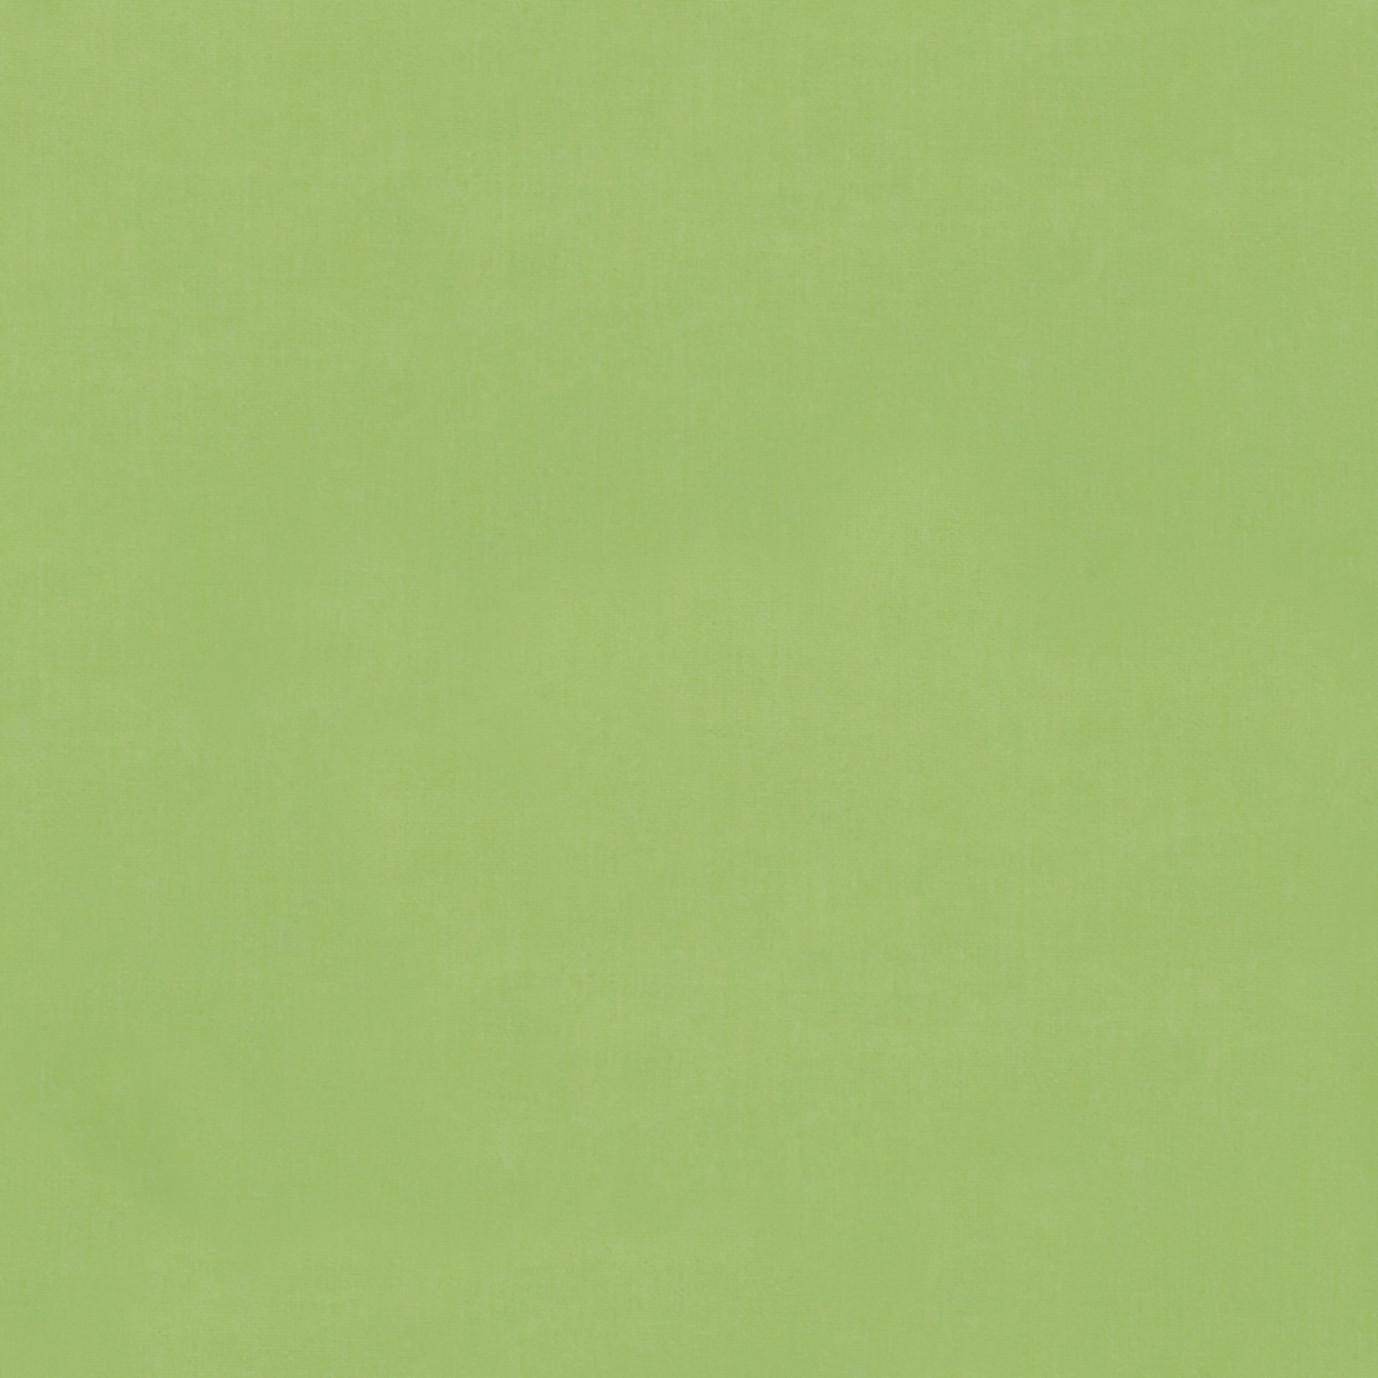 Deco™ 9pc Dining Set - Ginkgo Green